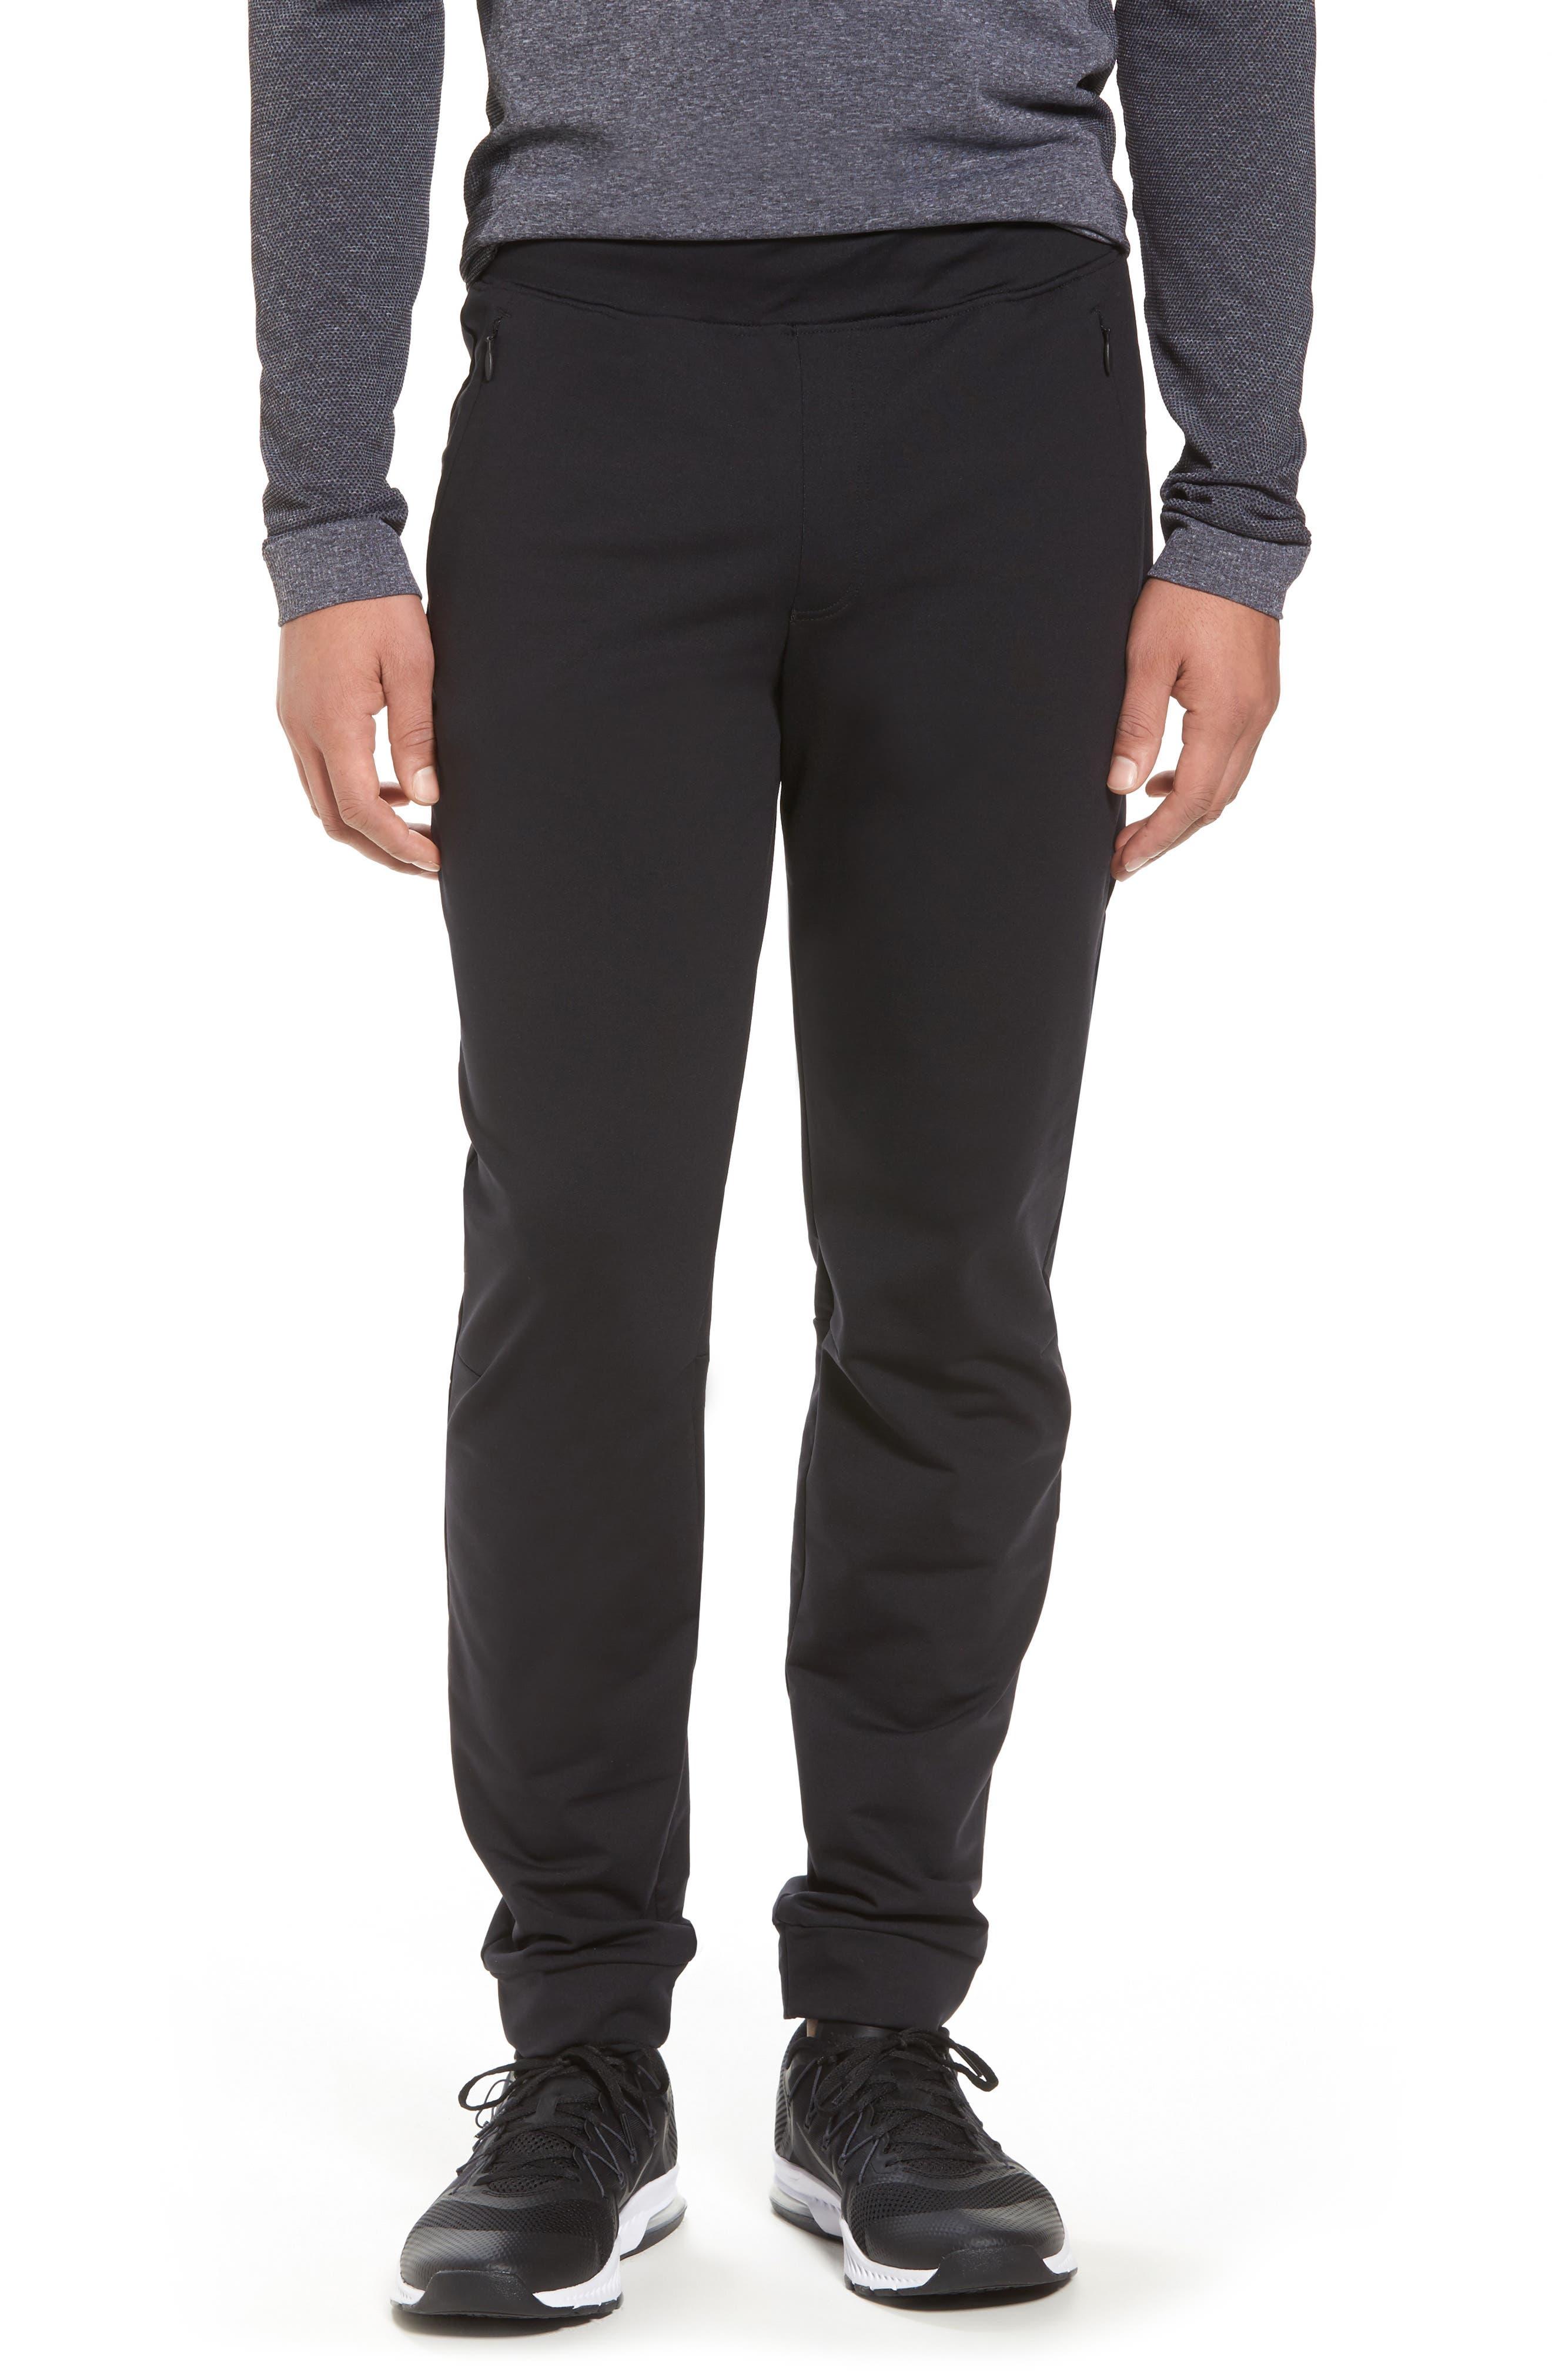 Everywear Jogger Pants,                         Main,                         color, Black